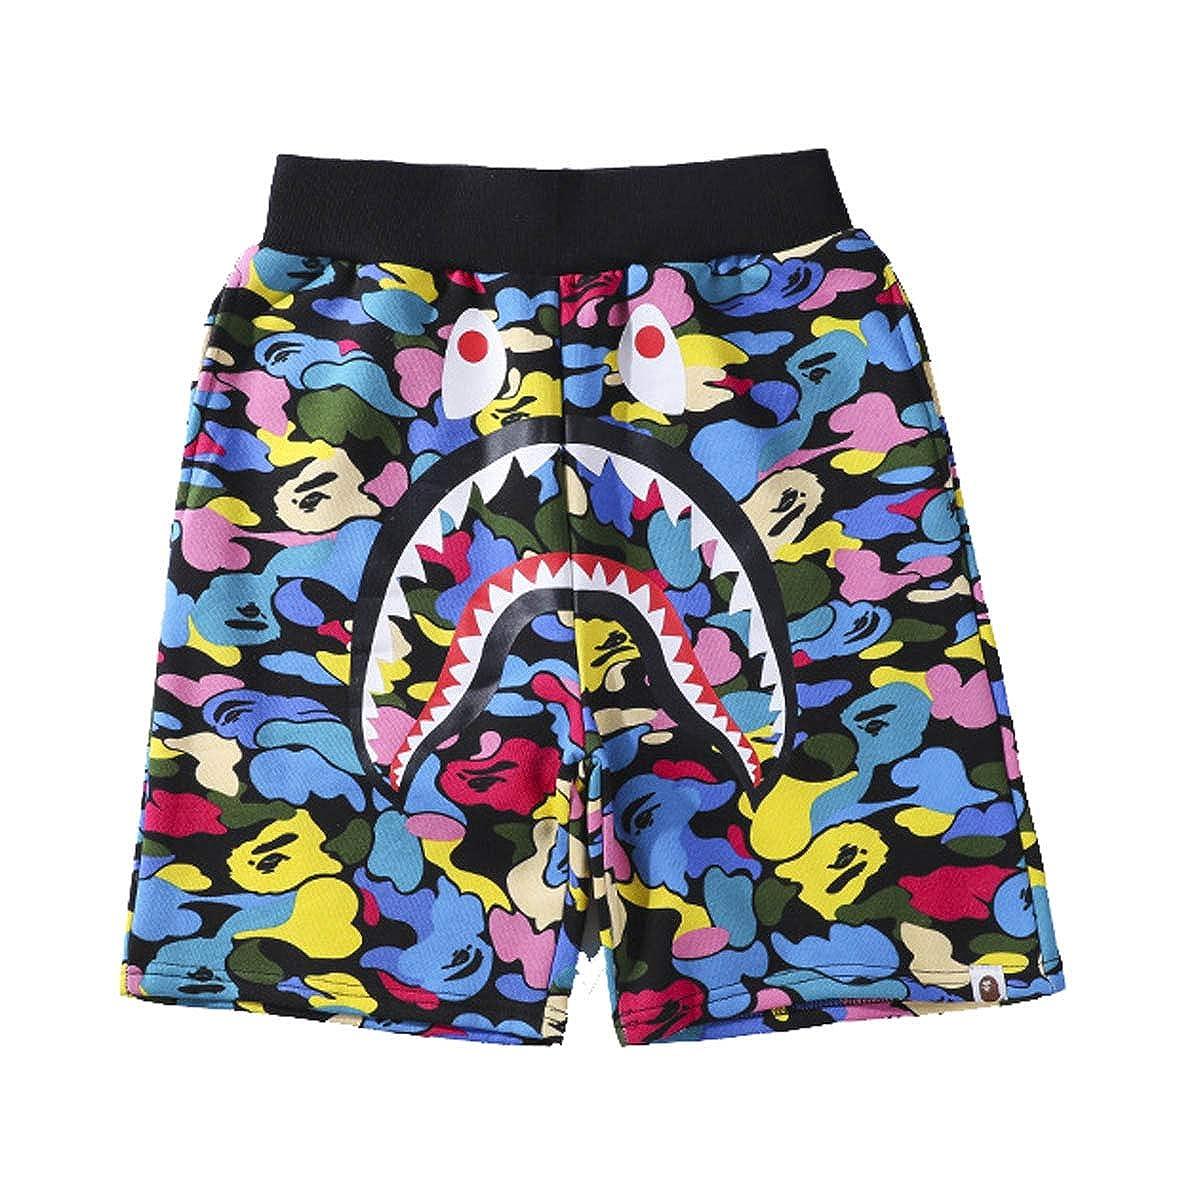 938db837 Men's/Women's Jungle Casual Short Pants BAPE A Bathing Ape Camouflage Shorts  Summer Beach Pants Sports Jump Rope Shorts at Amazon Men's Clothing store: